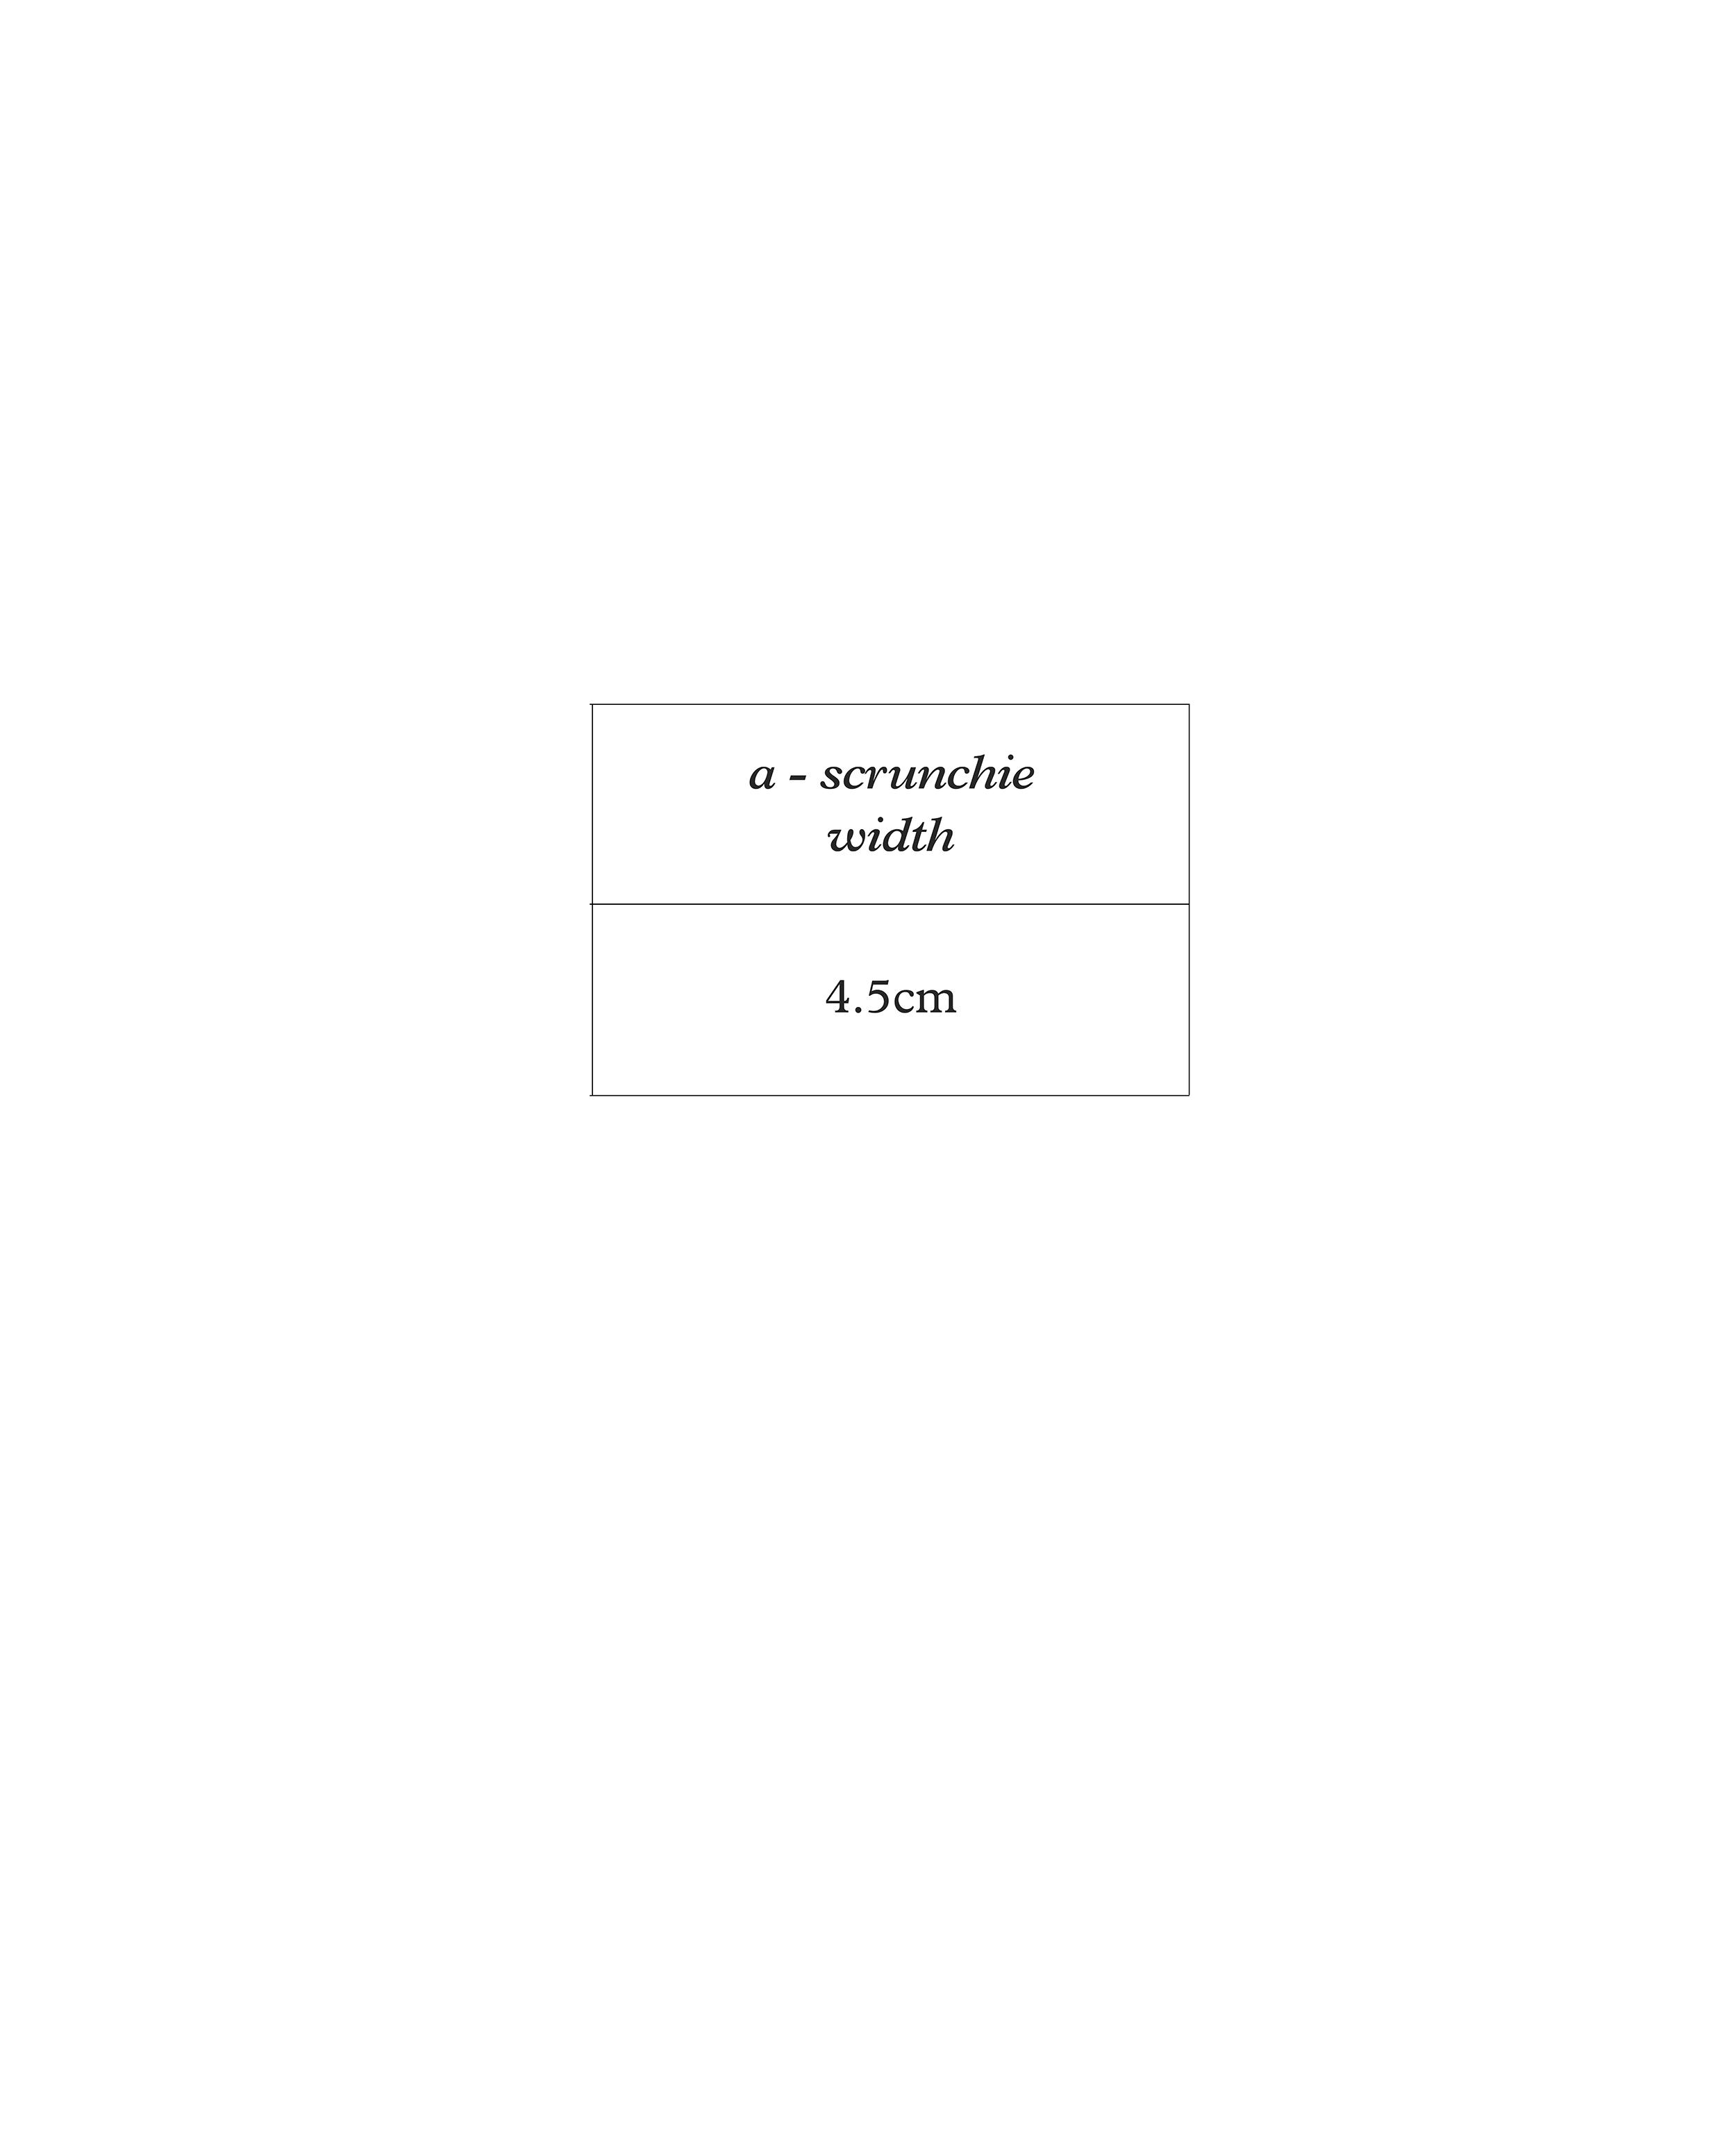 #044 scrunchie - size guide.jpg